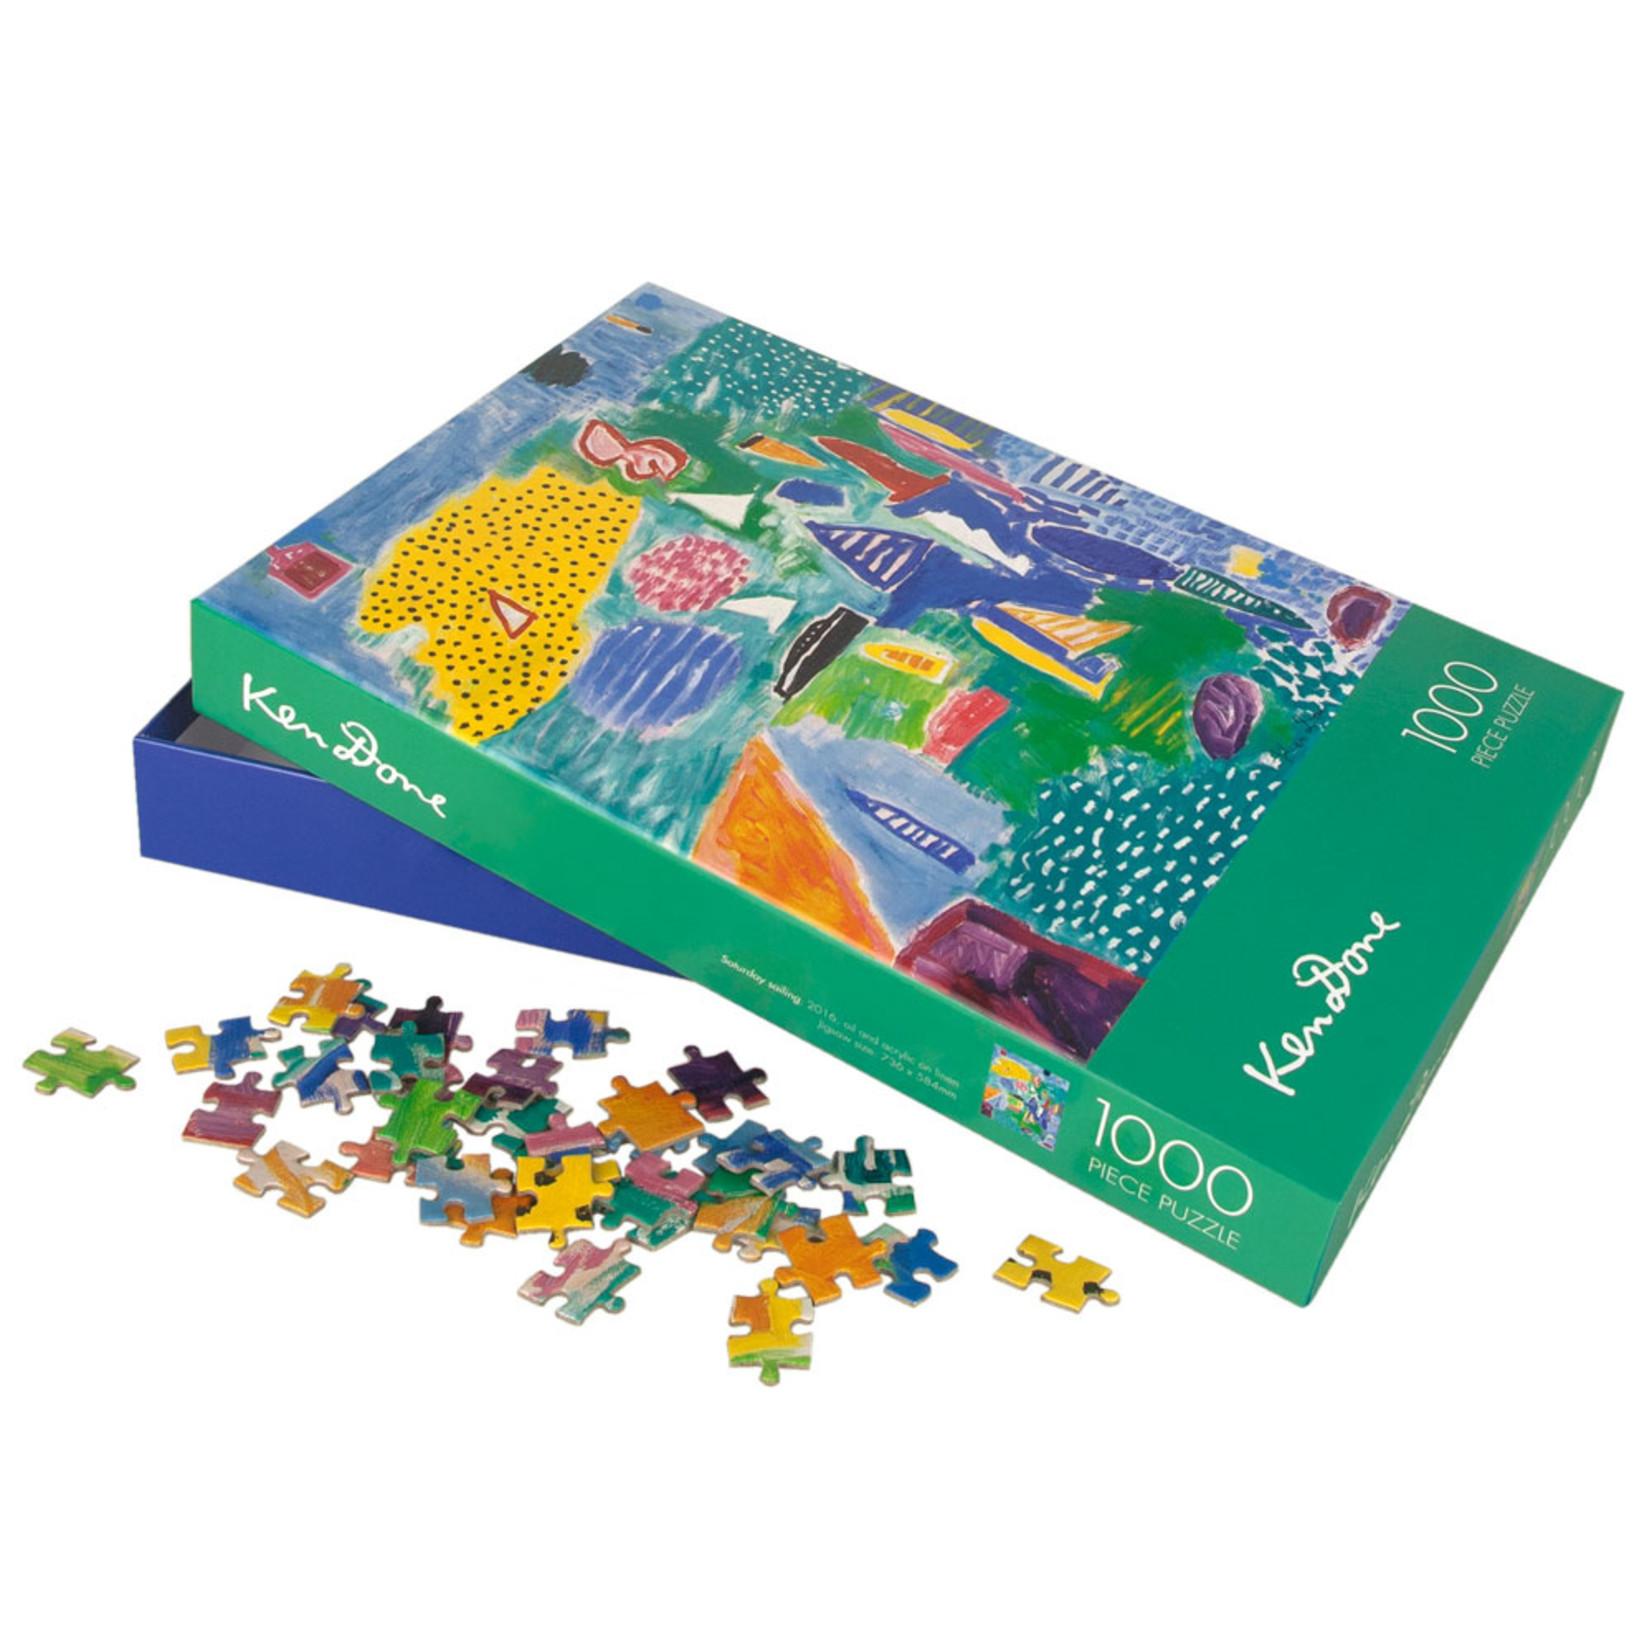 Books & Stationery Jigsaw puzzle - Saturday sailing